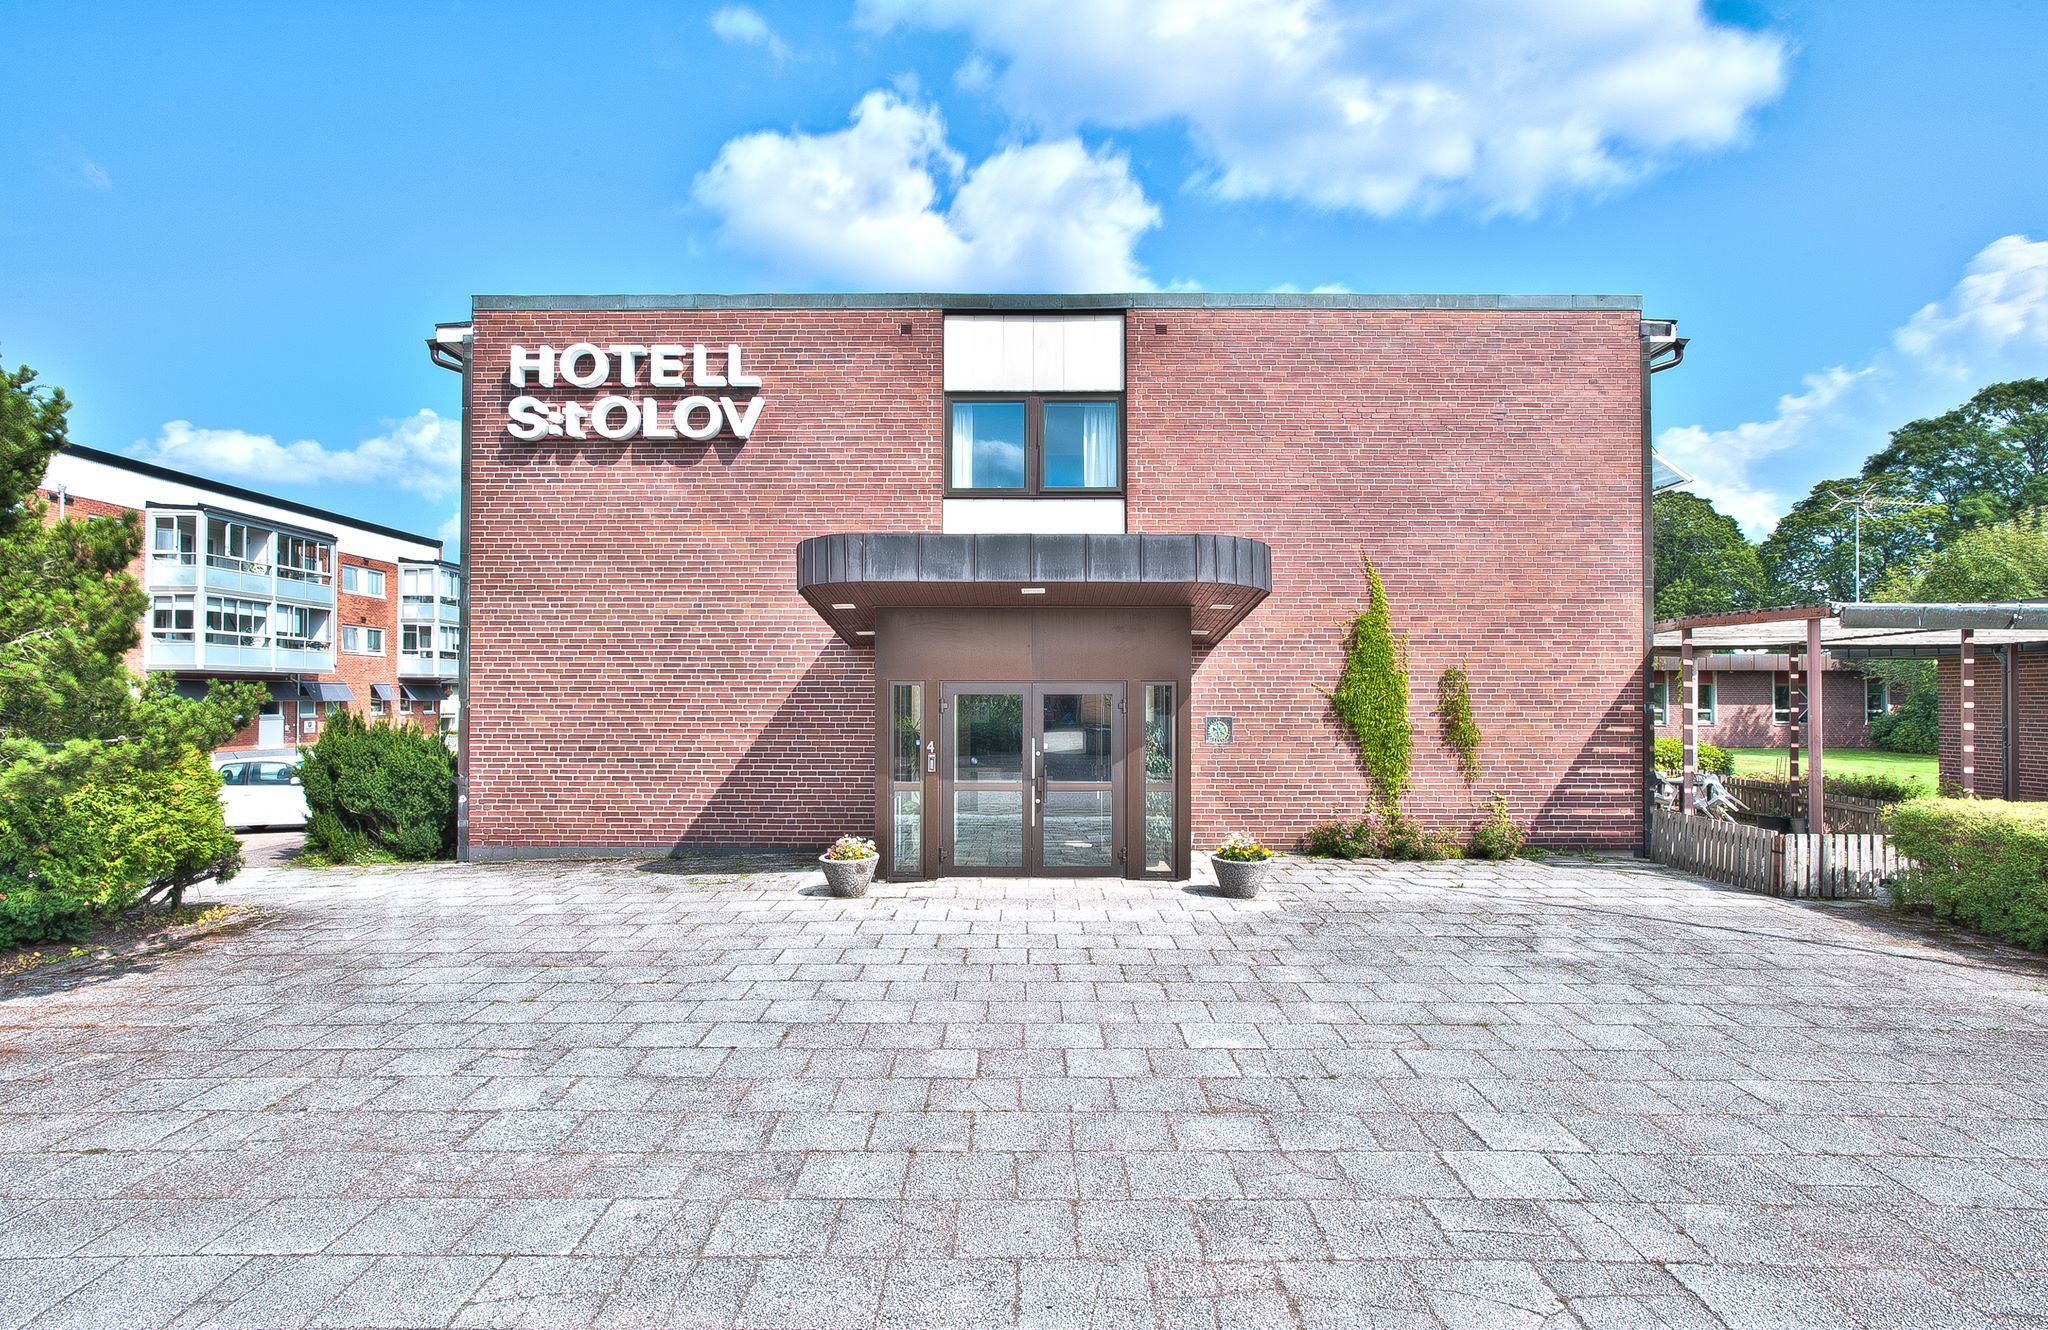 Olof Hotell & Restaurang, Olof - Hotell & Restaurang